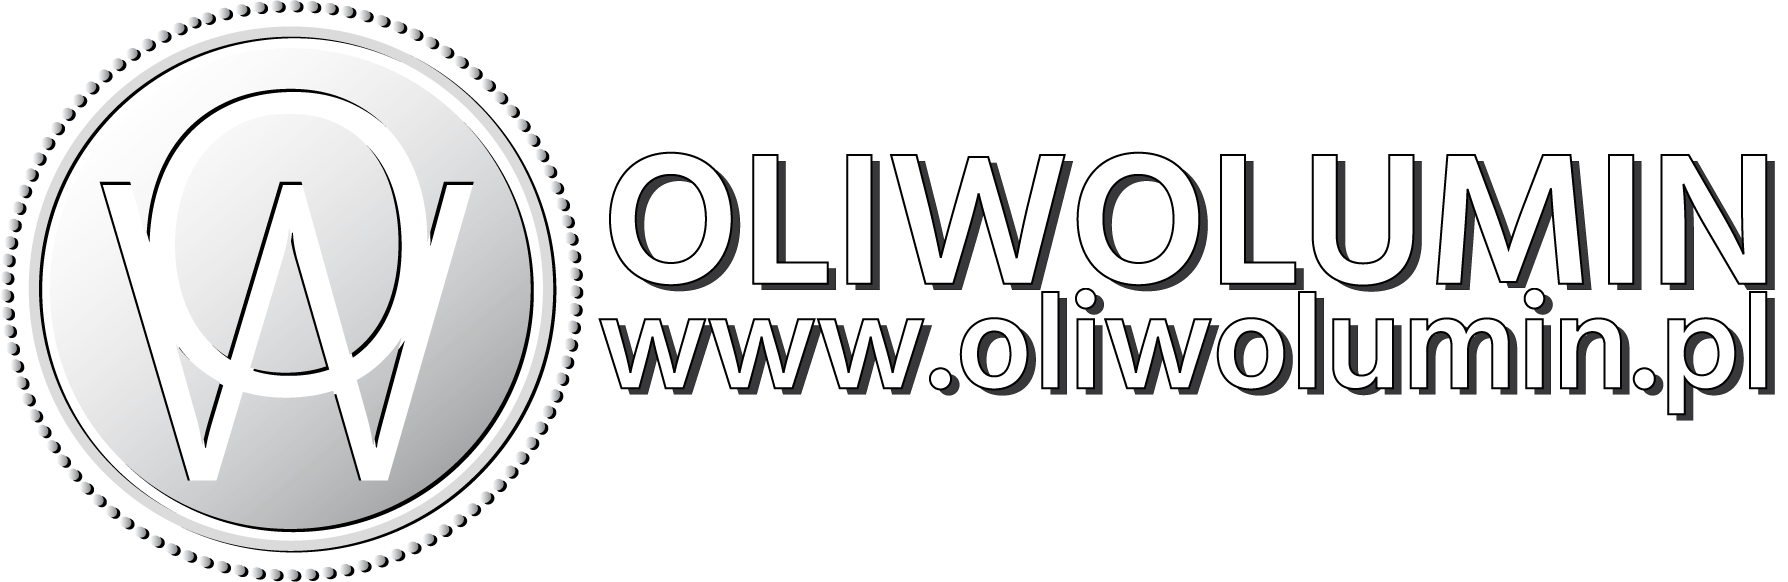 OliWolumin